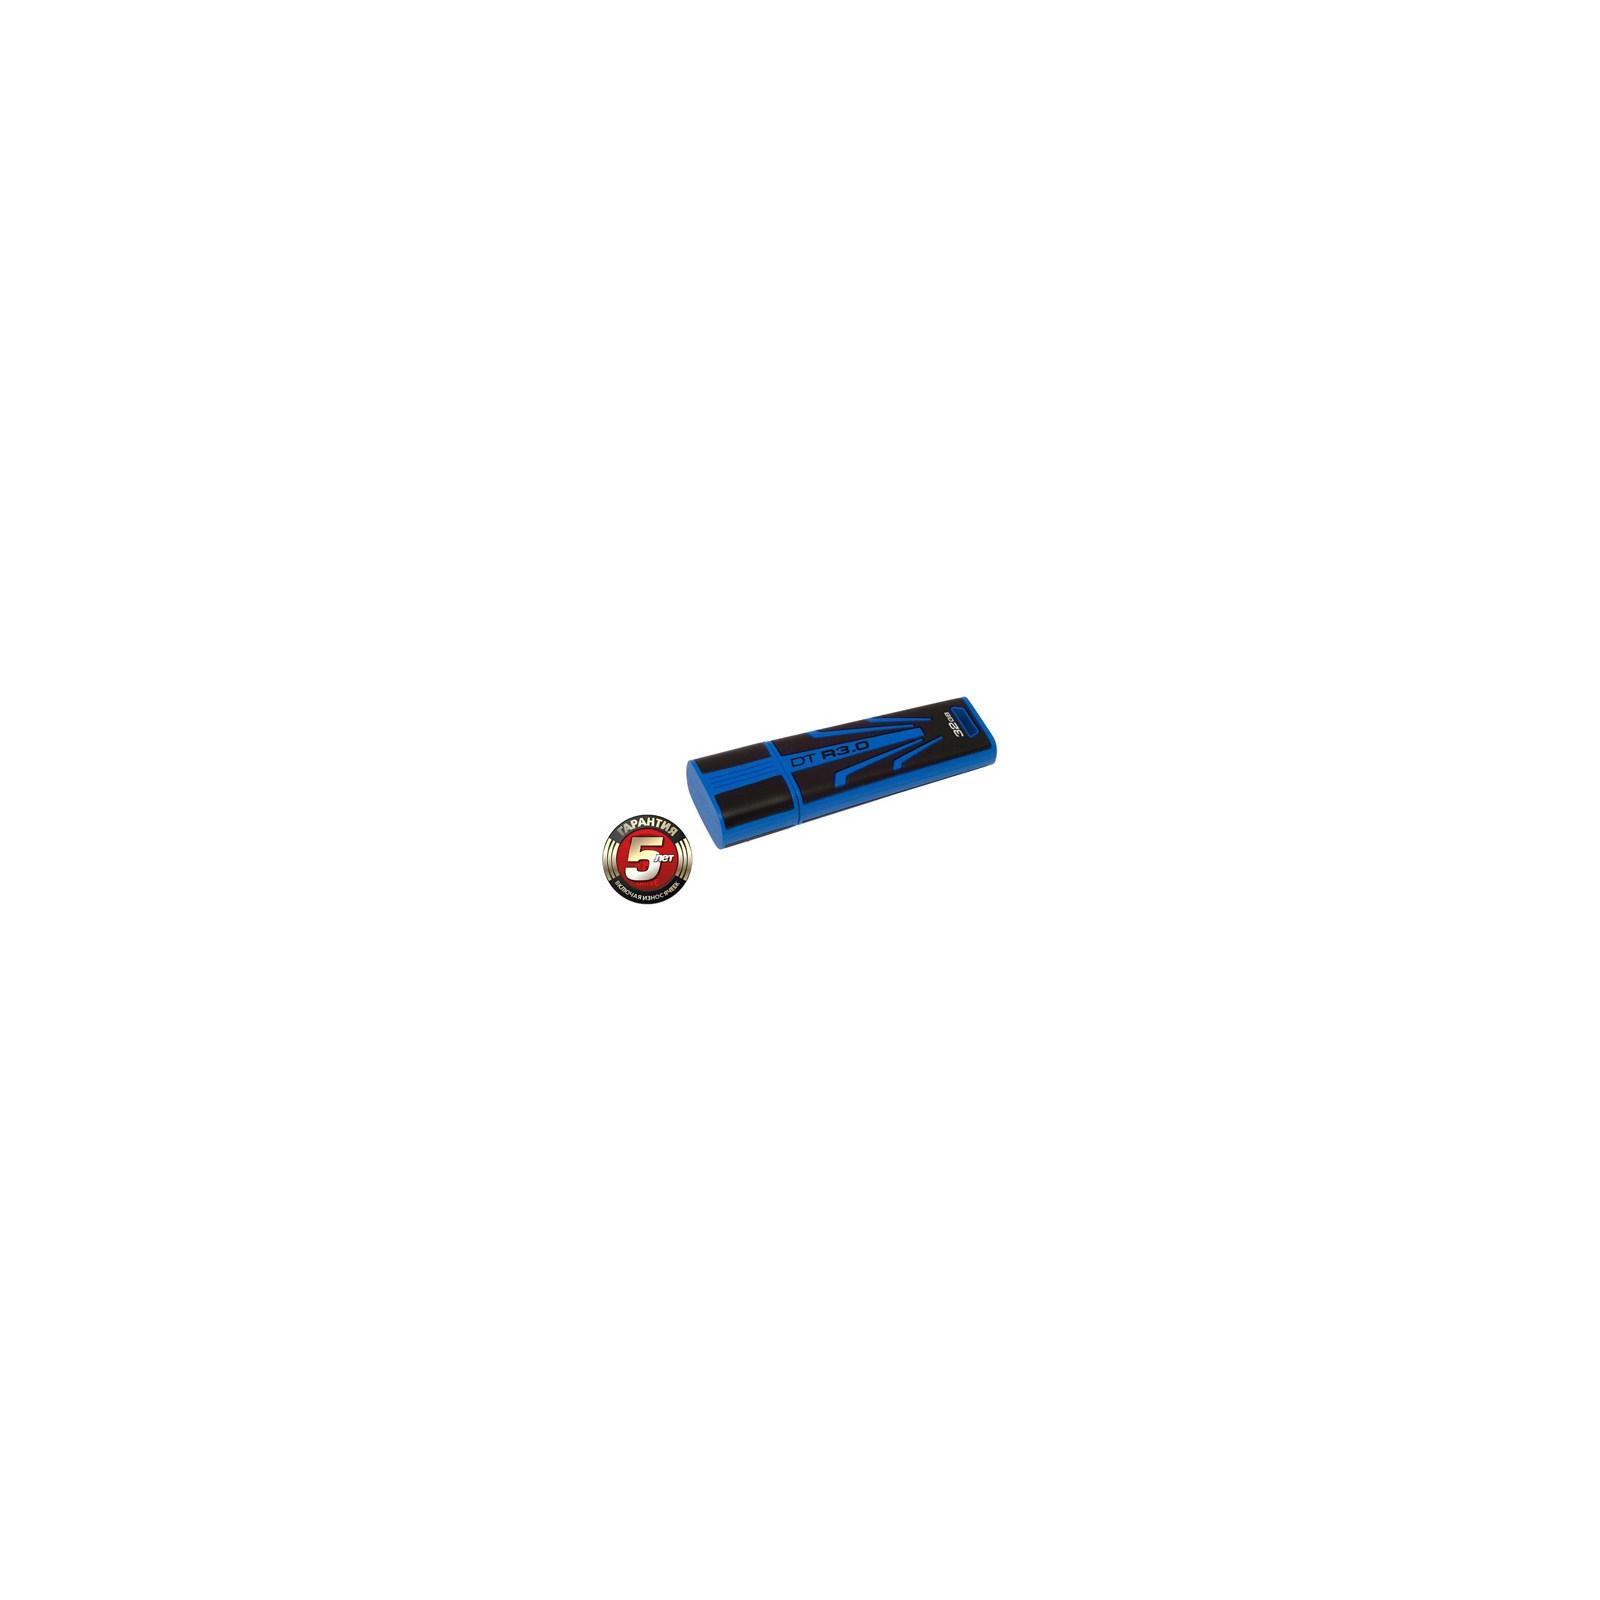 USB флеш накопитель Kingston 32Gb DataTraveler R3.0 (DTR30/32GB)